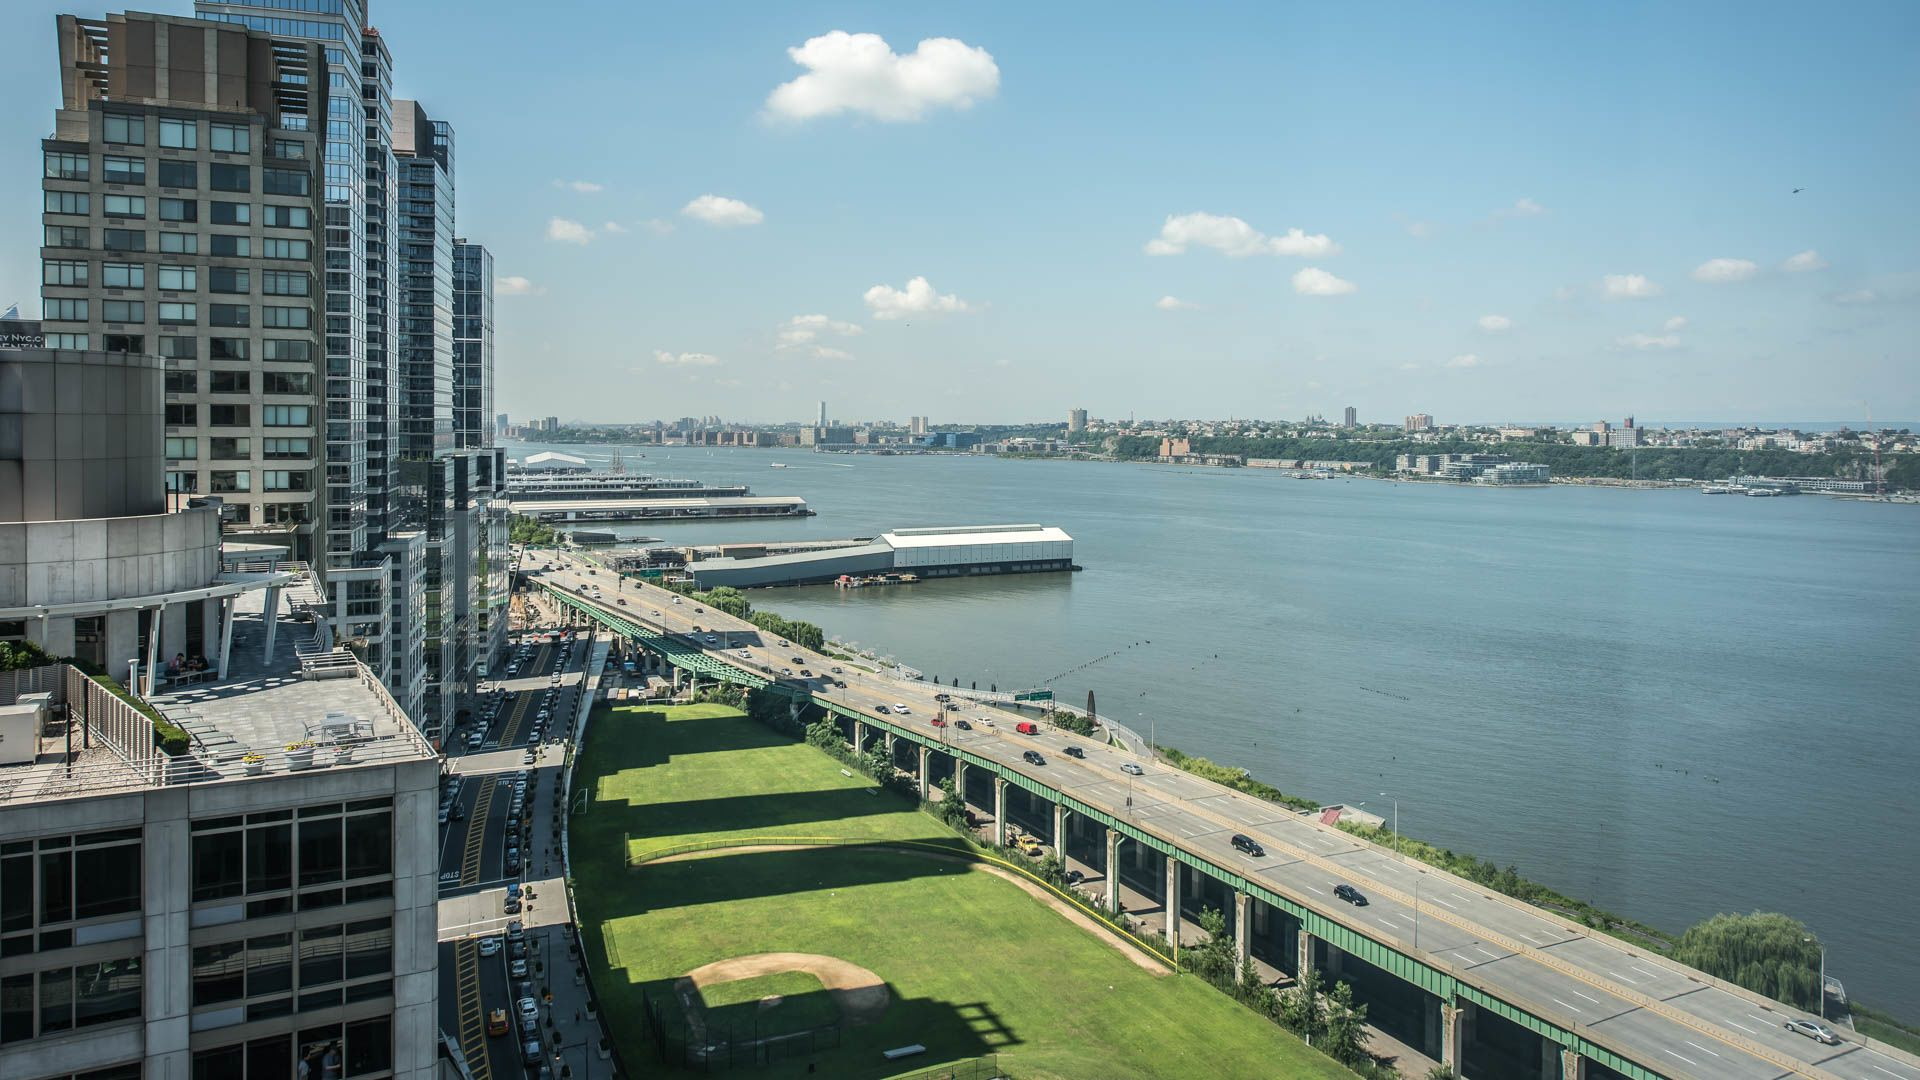 Trump Place 140 Riverside Blvd Apartments - Views